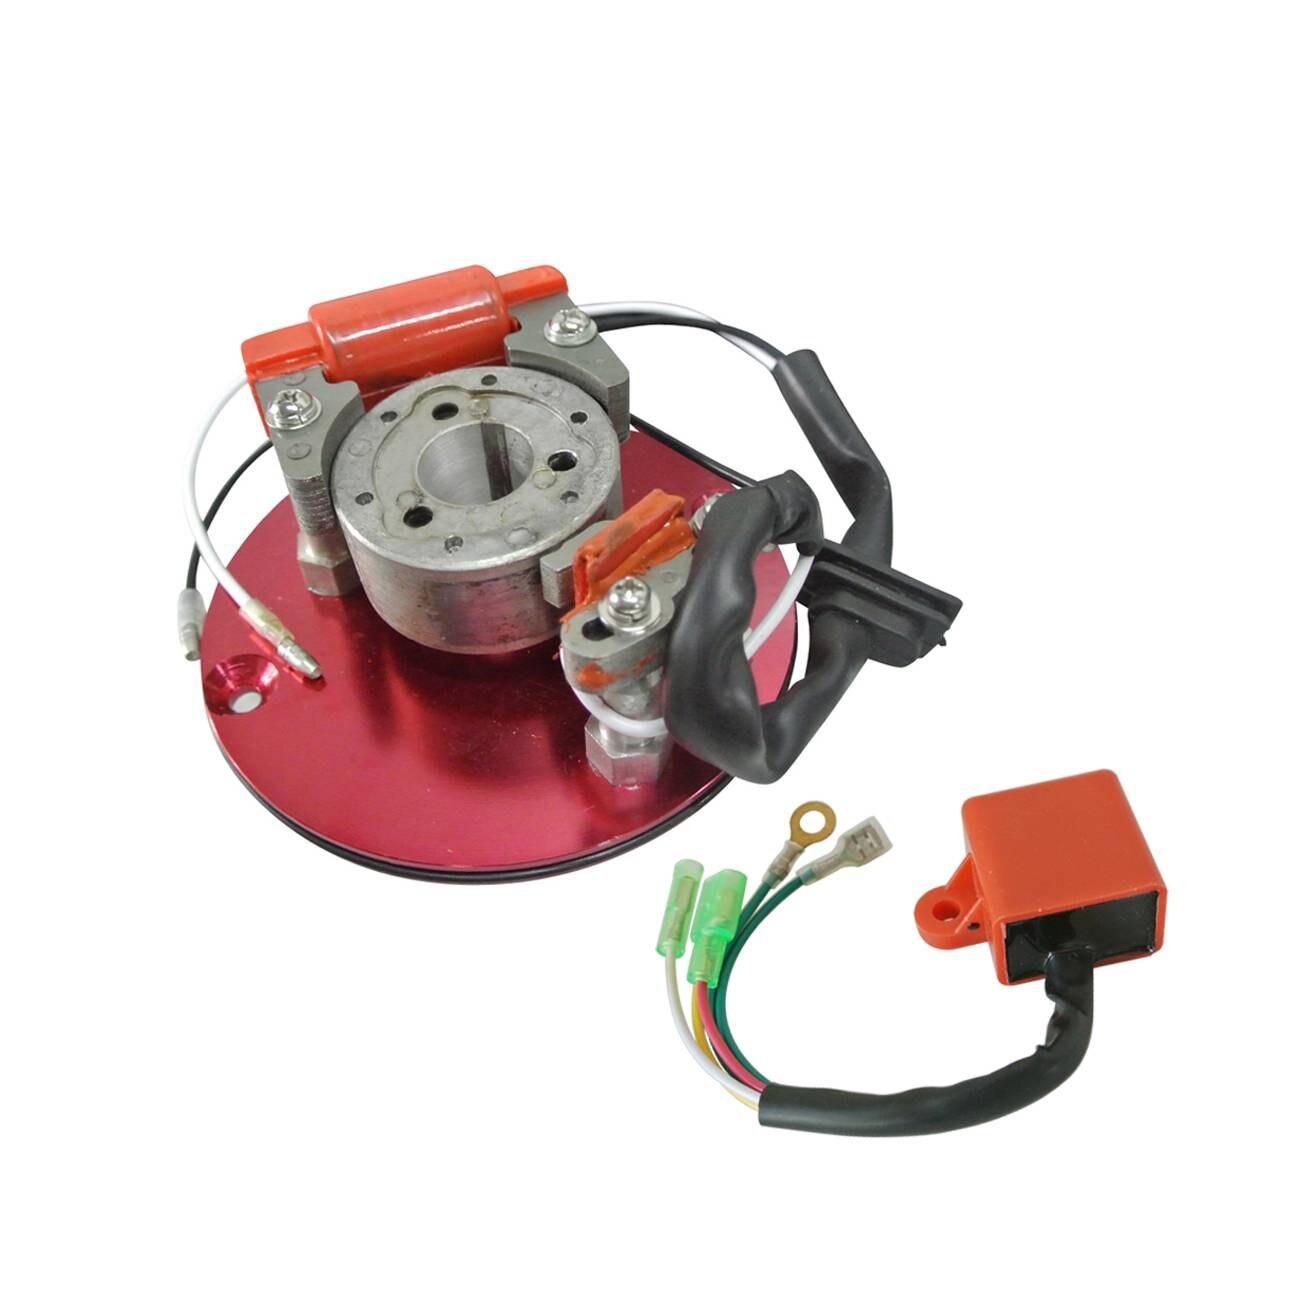 Racing magneto stator fit 4 stroke 49cc 70cc 90cc 100cc 110cc 125cc atv china